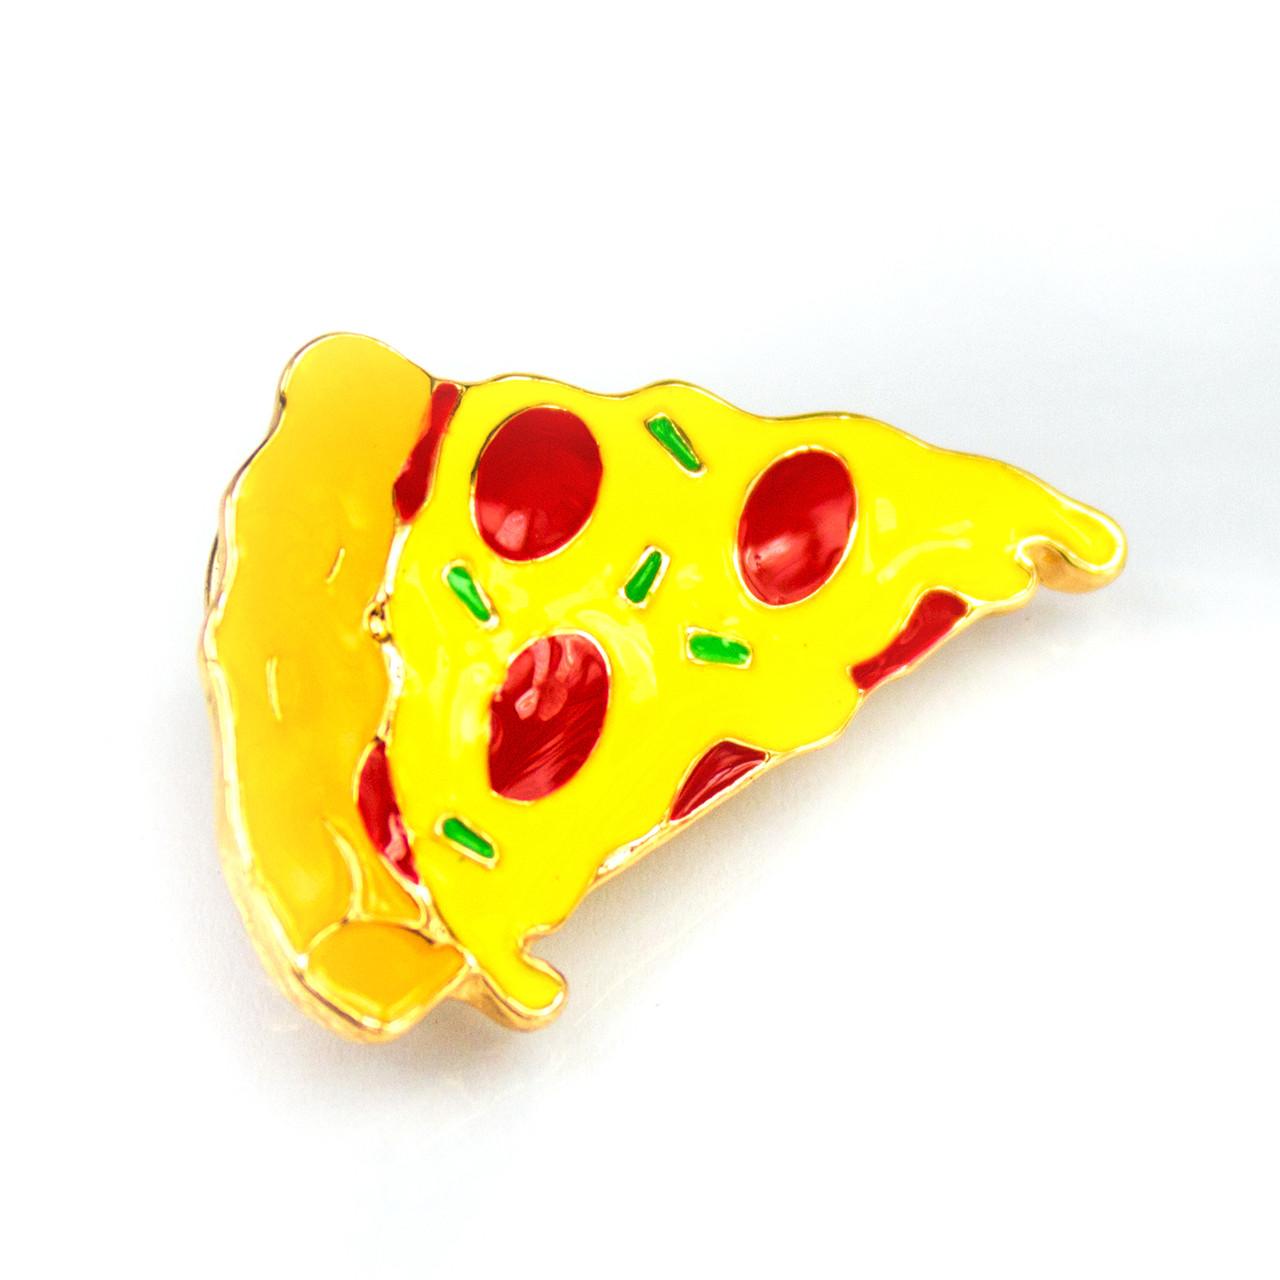 Значок Пицца Pin Up Street Food Collection